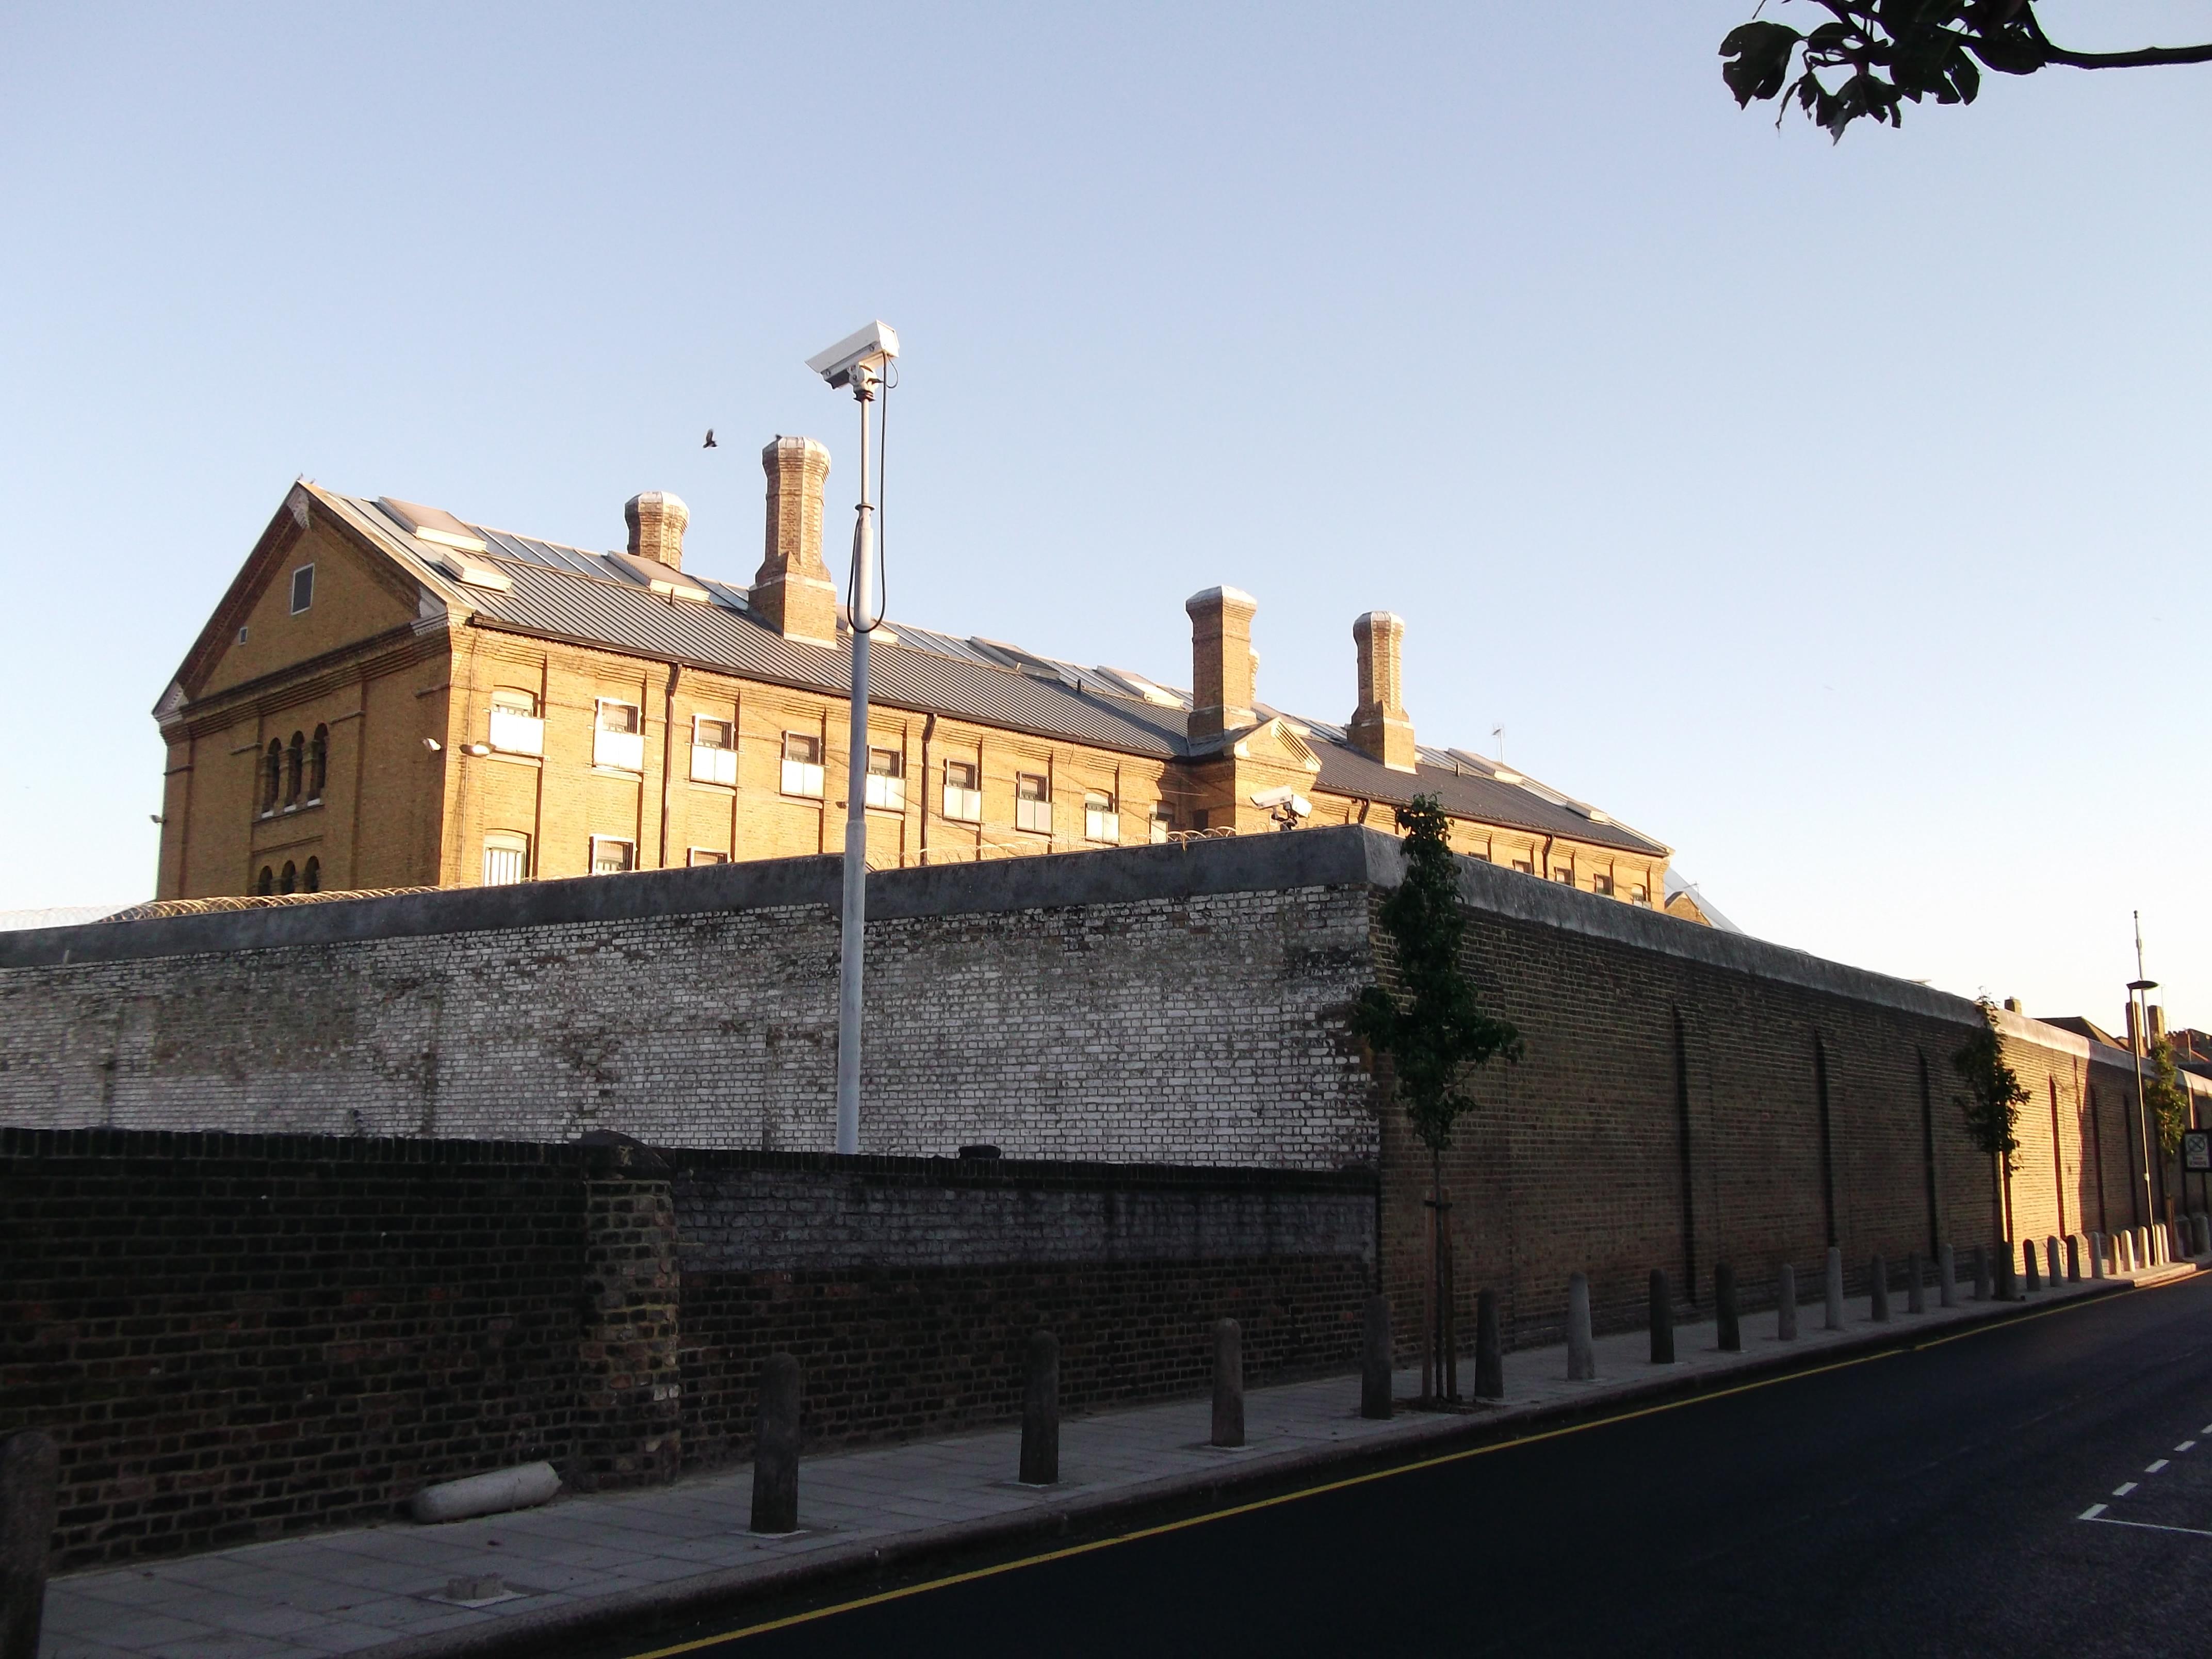 Wall_of_H.M._Prison_Brixton_(geograph_2640556)